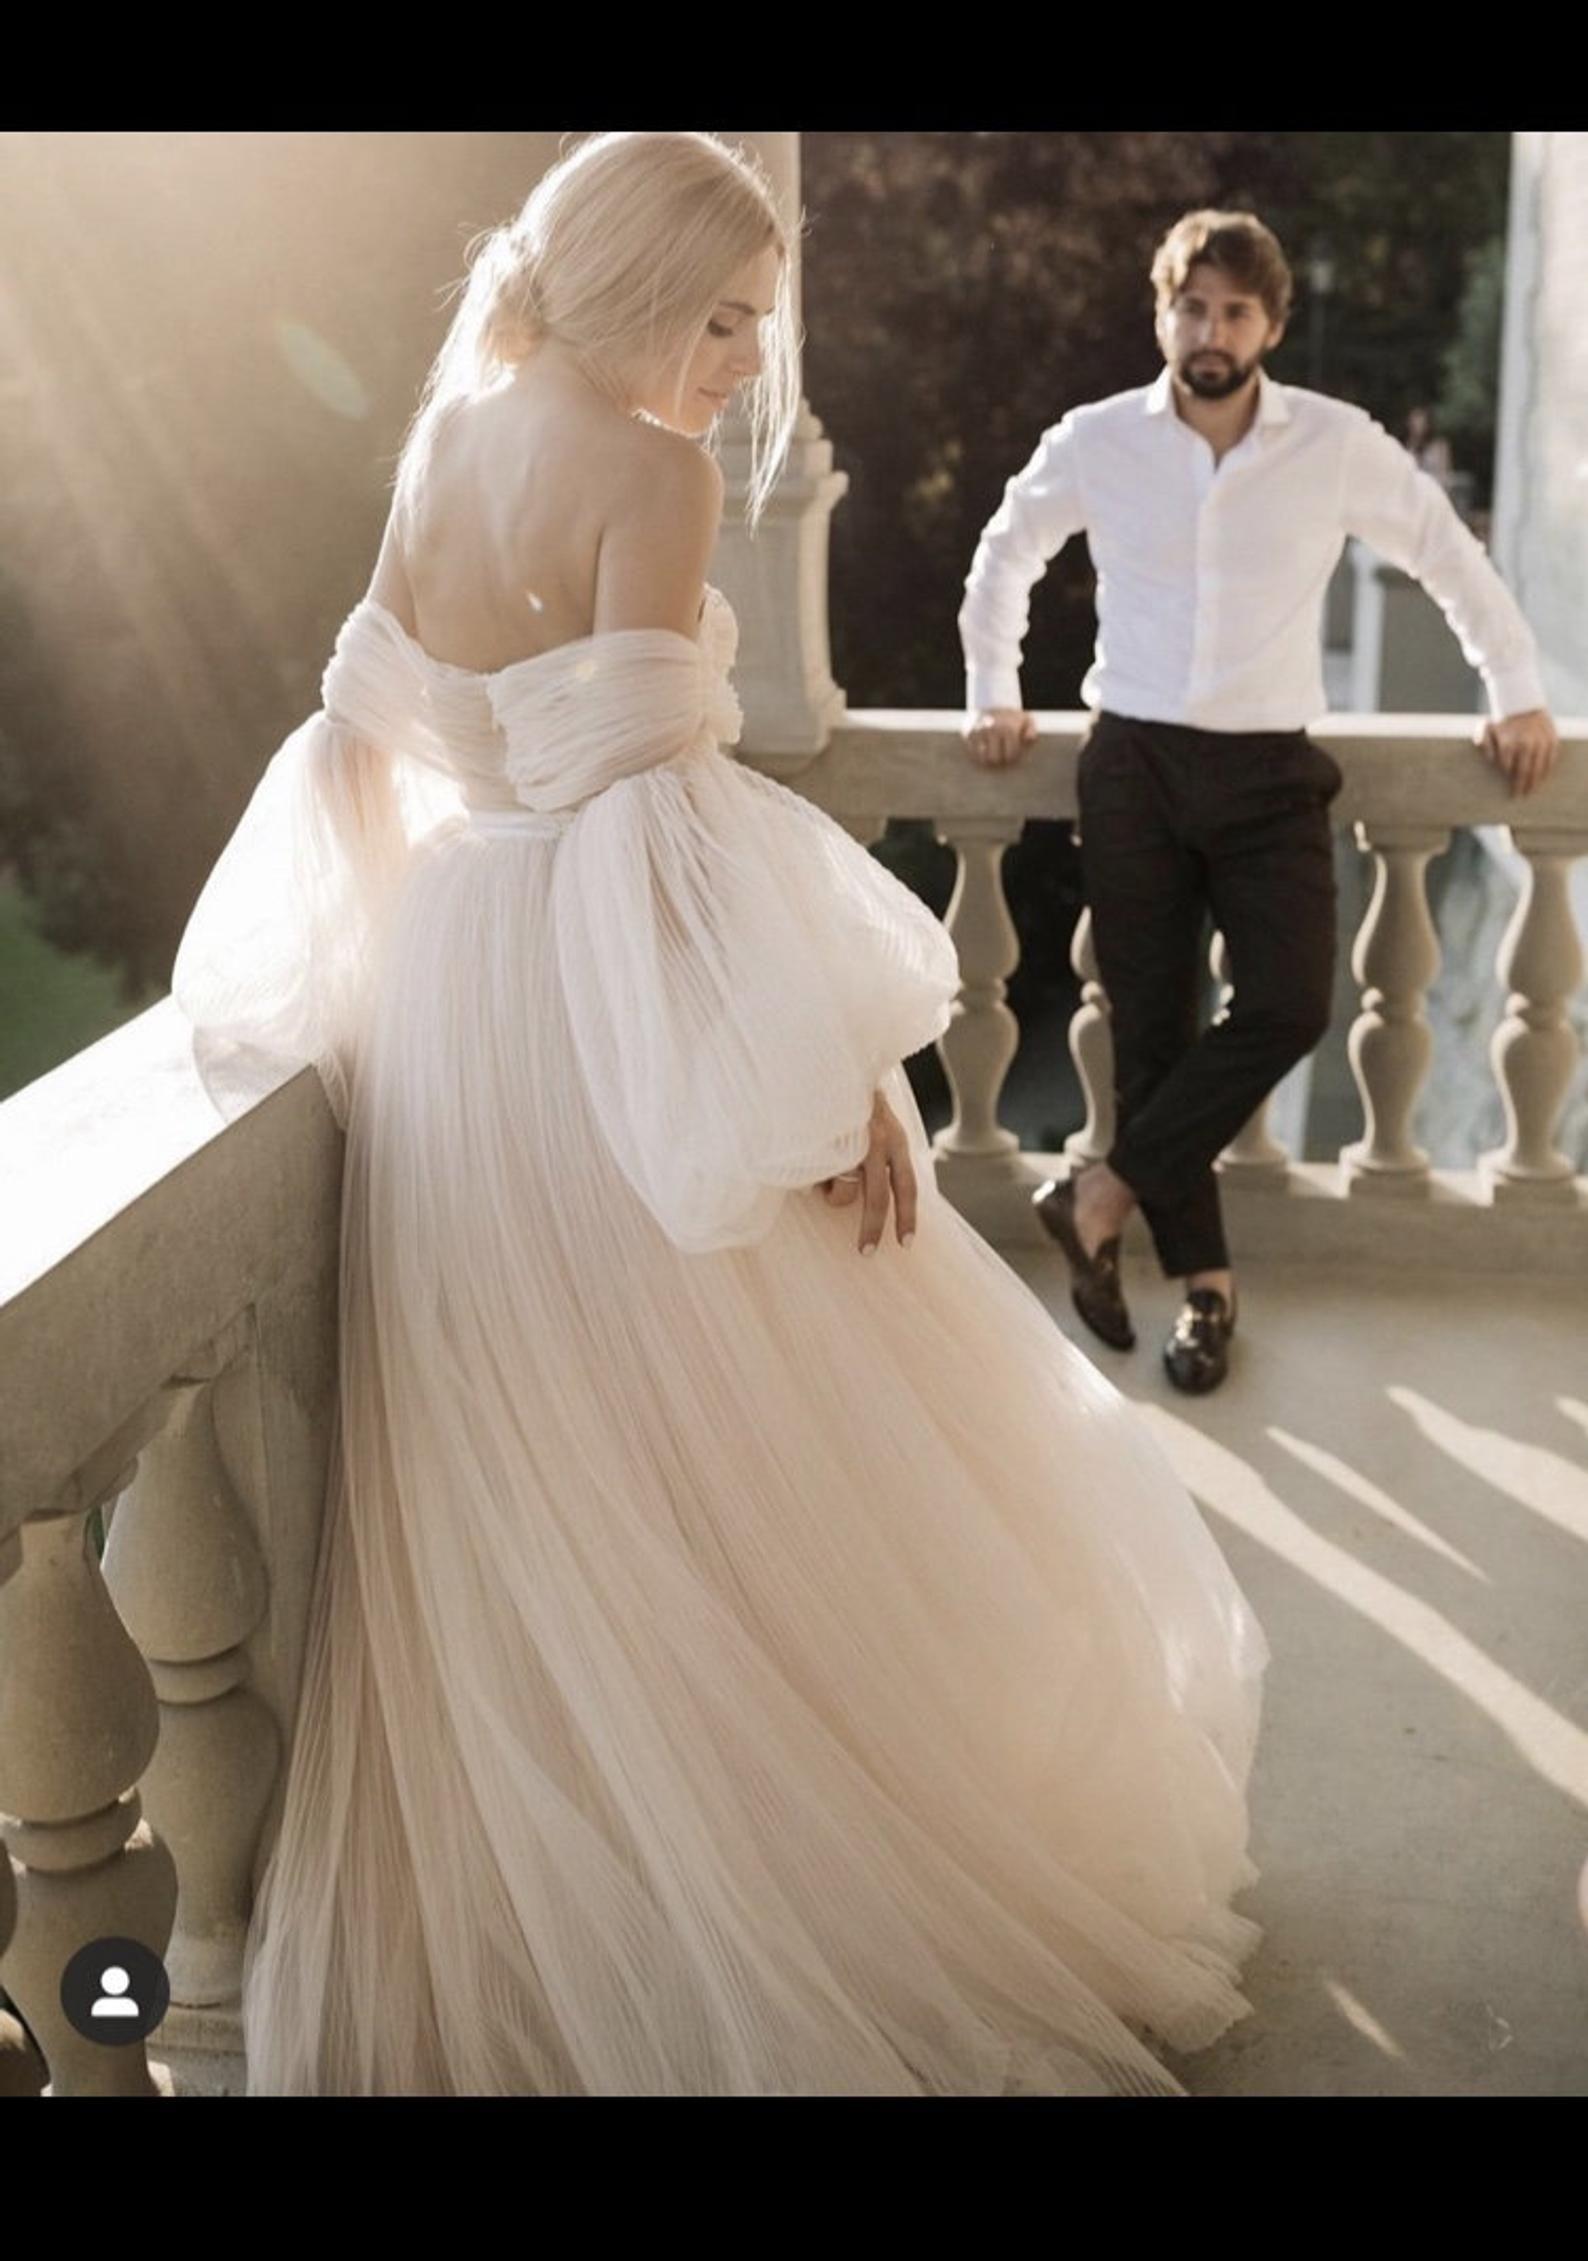 Brand New Ivory Cream Wedding Dress Uk Size 8 Etsy In 2020 Wedding Dresses Uk Non White Wedding Dresses Off Shoulder Wedding Dress